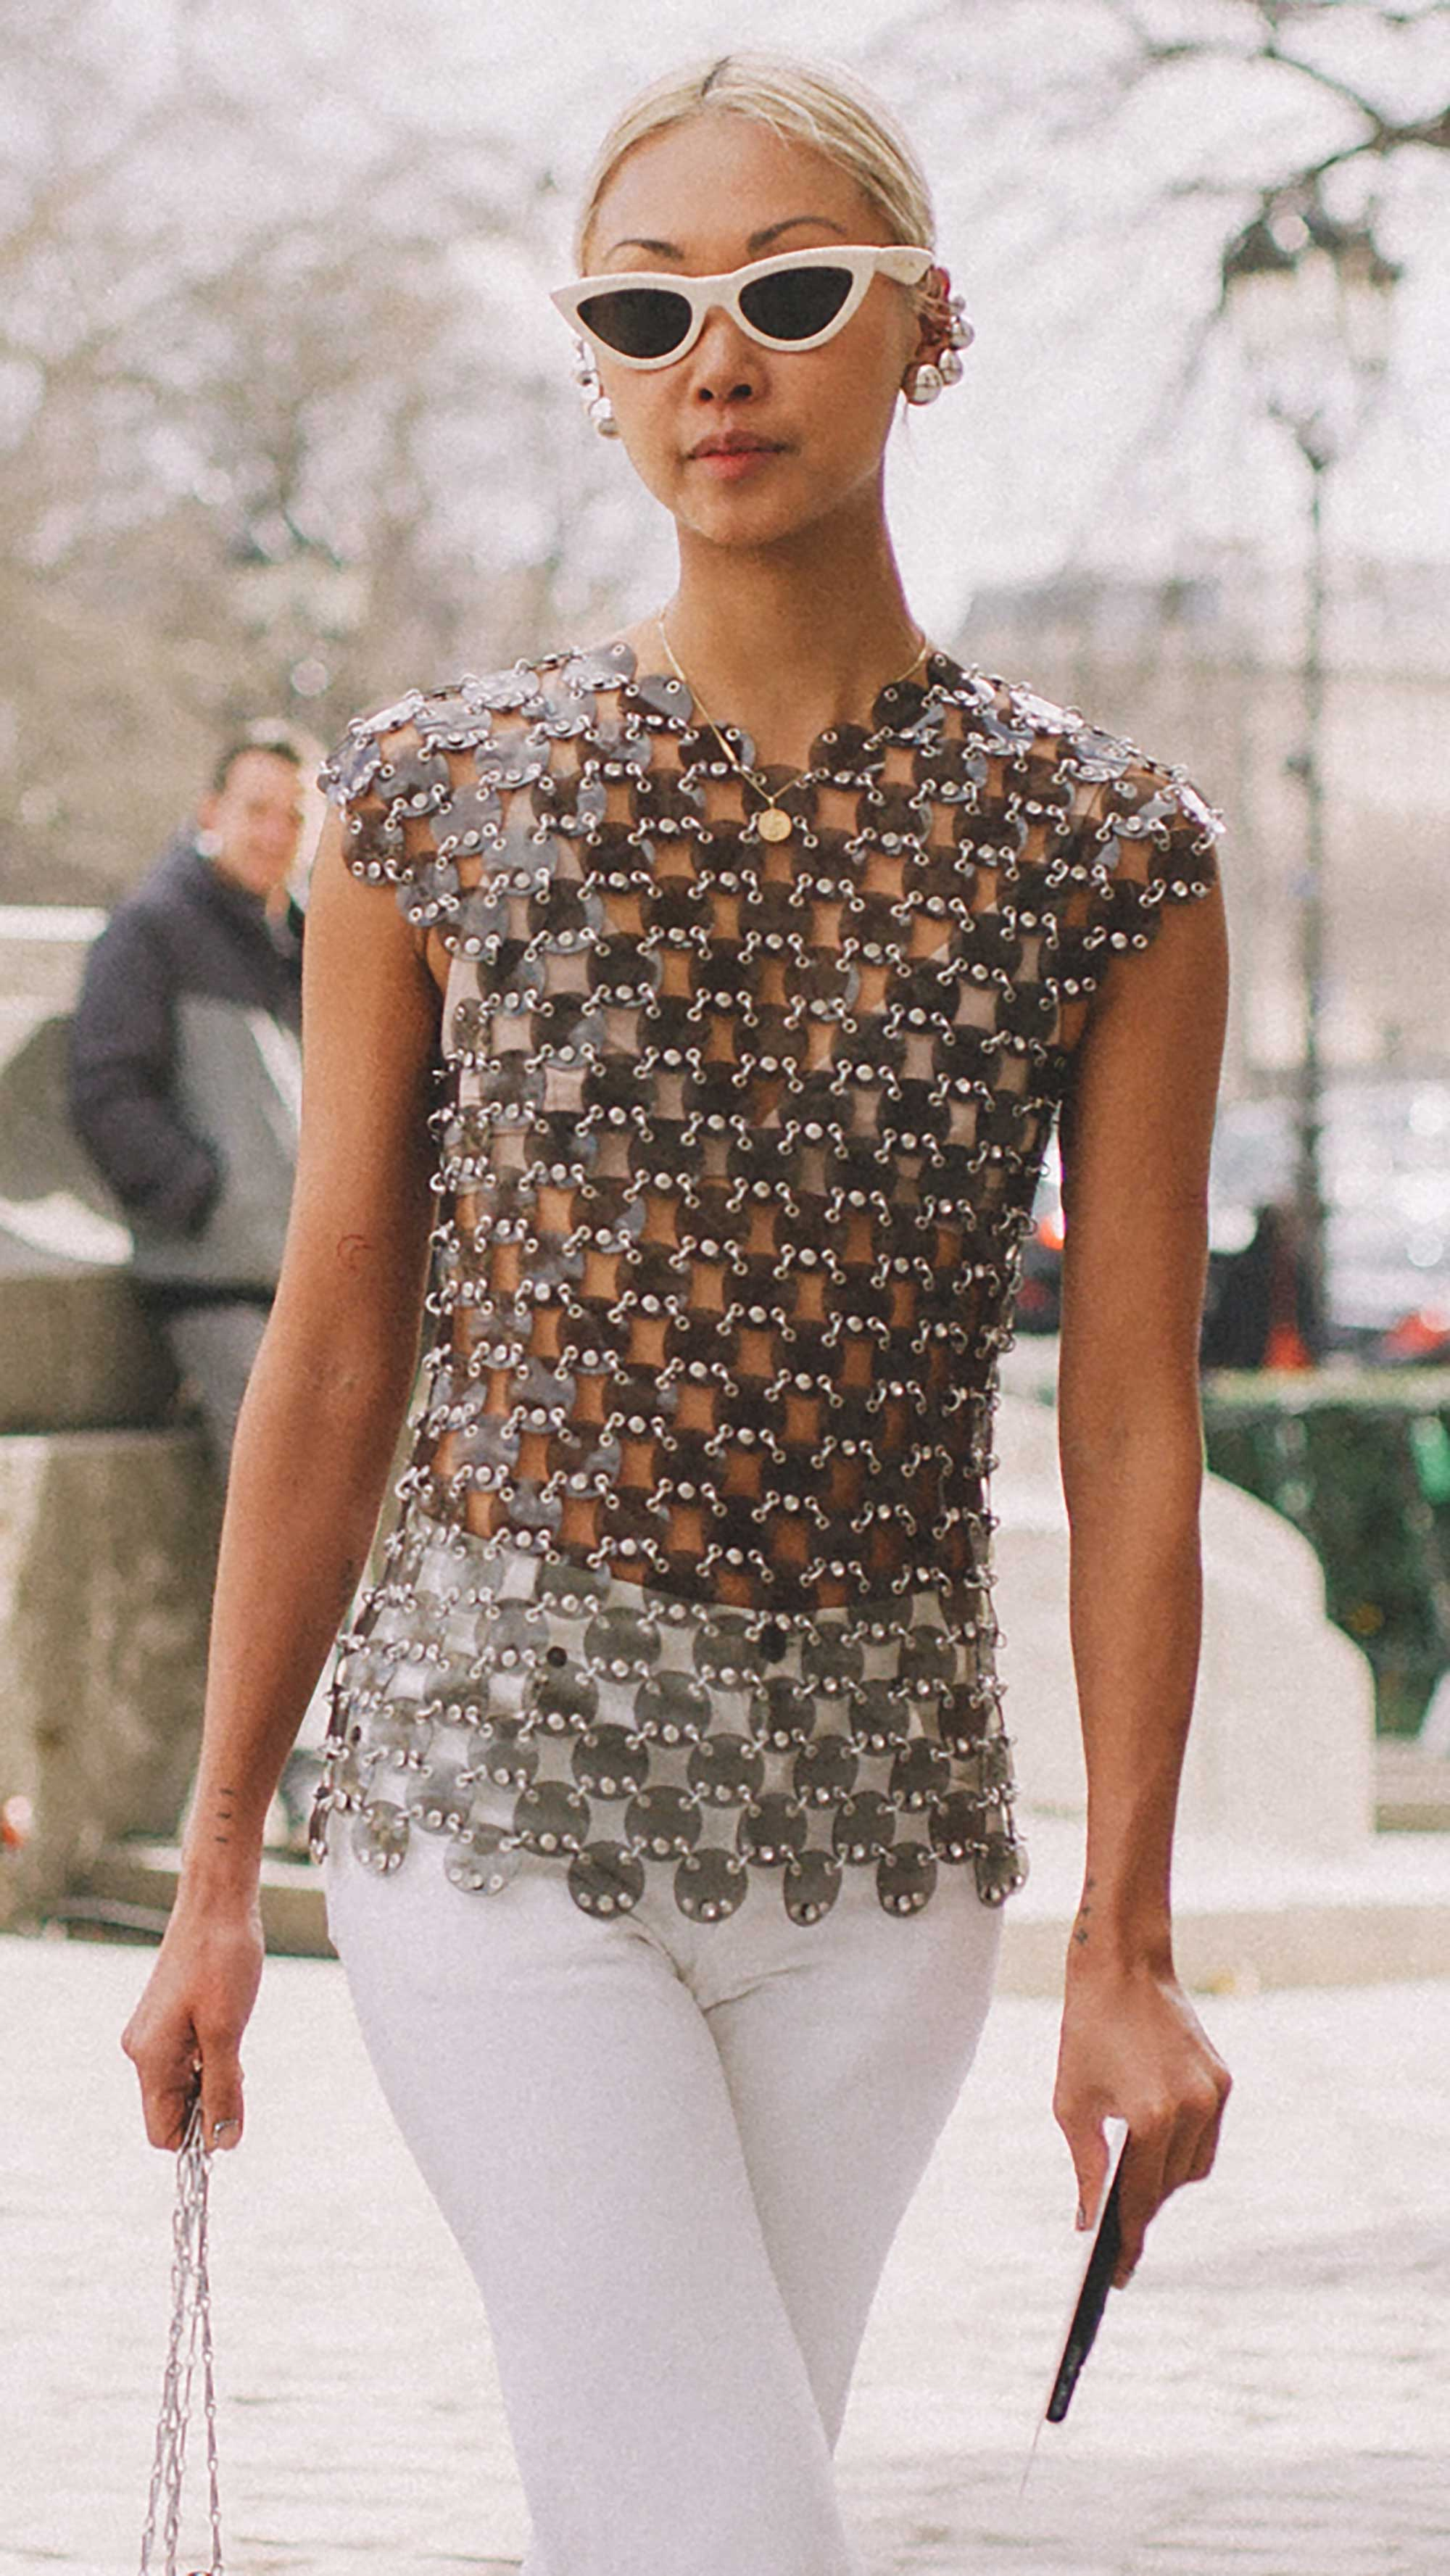 Best outfits of Paris Fashion Week street style day three PFW FW19 - 68.jpg